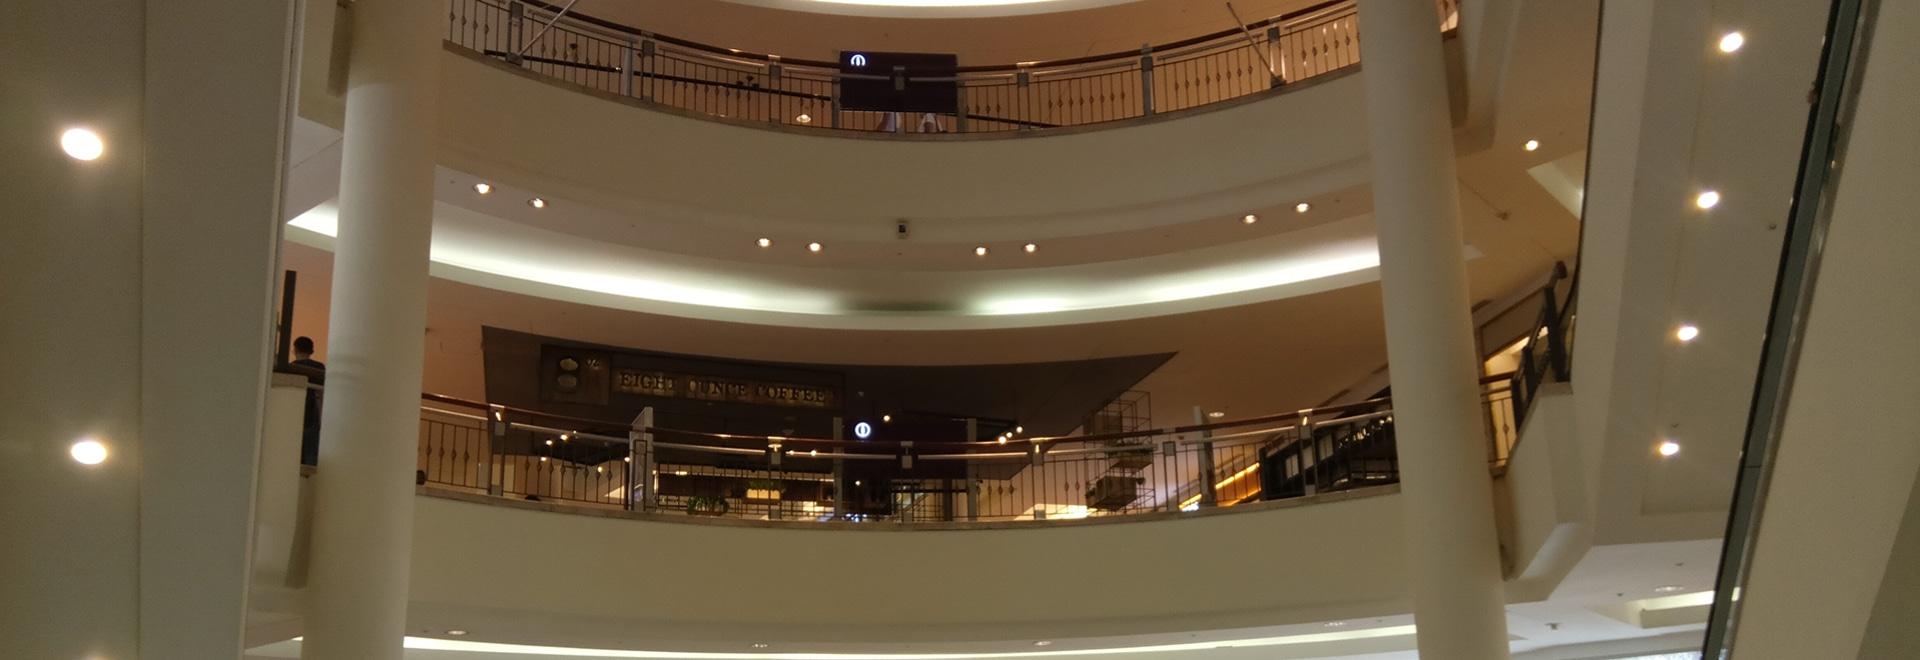 Deep Optical Darklight reflector downlight for shopping center